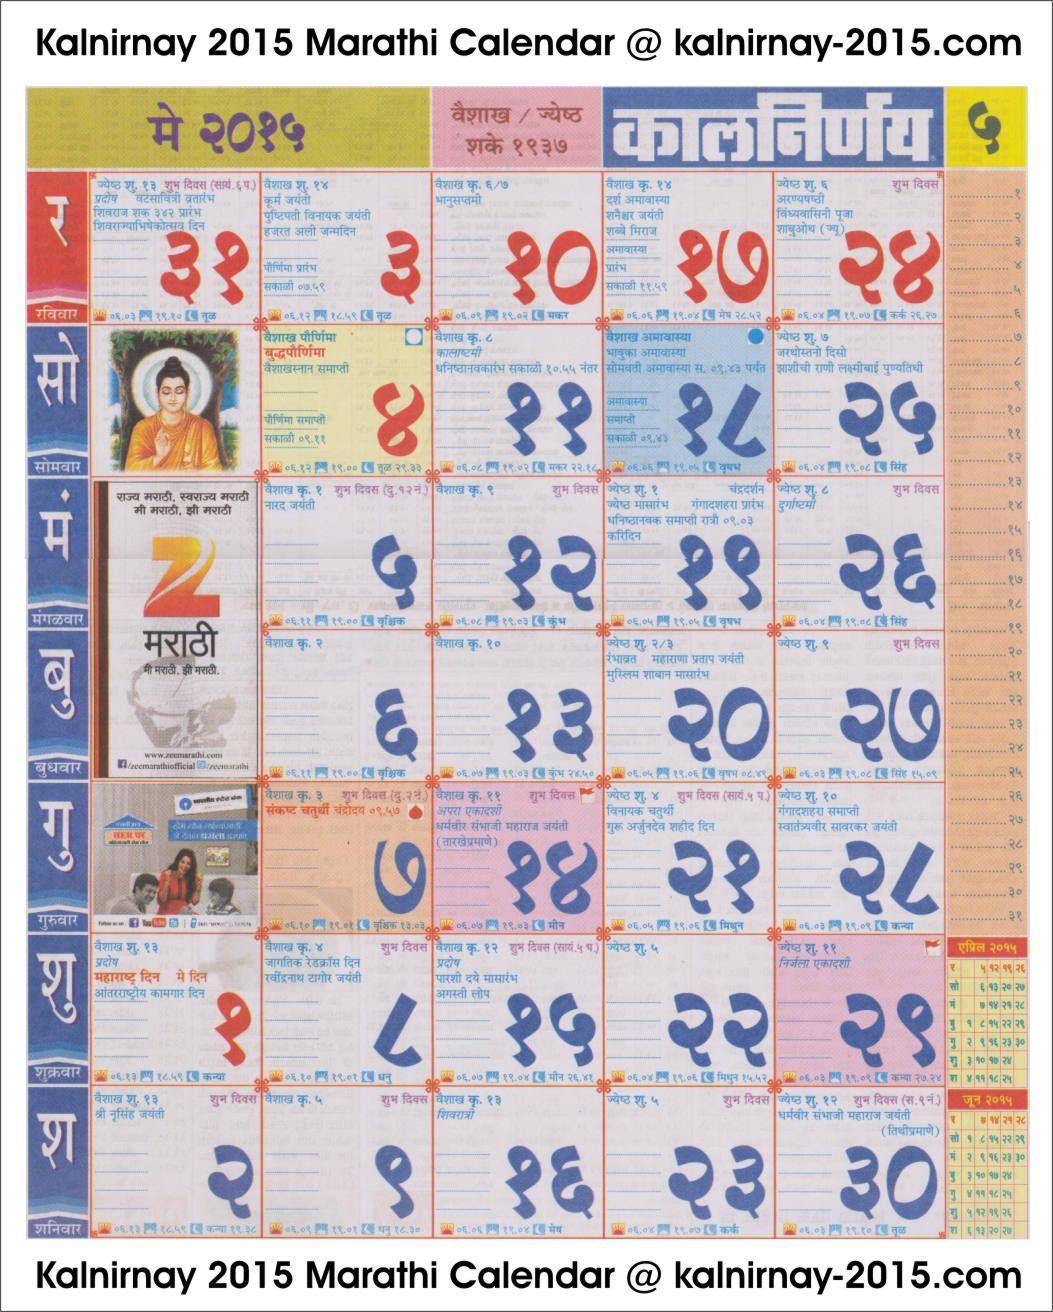 May Marathi Calendar : May marathi kalnirnay calendar